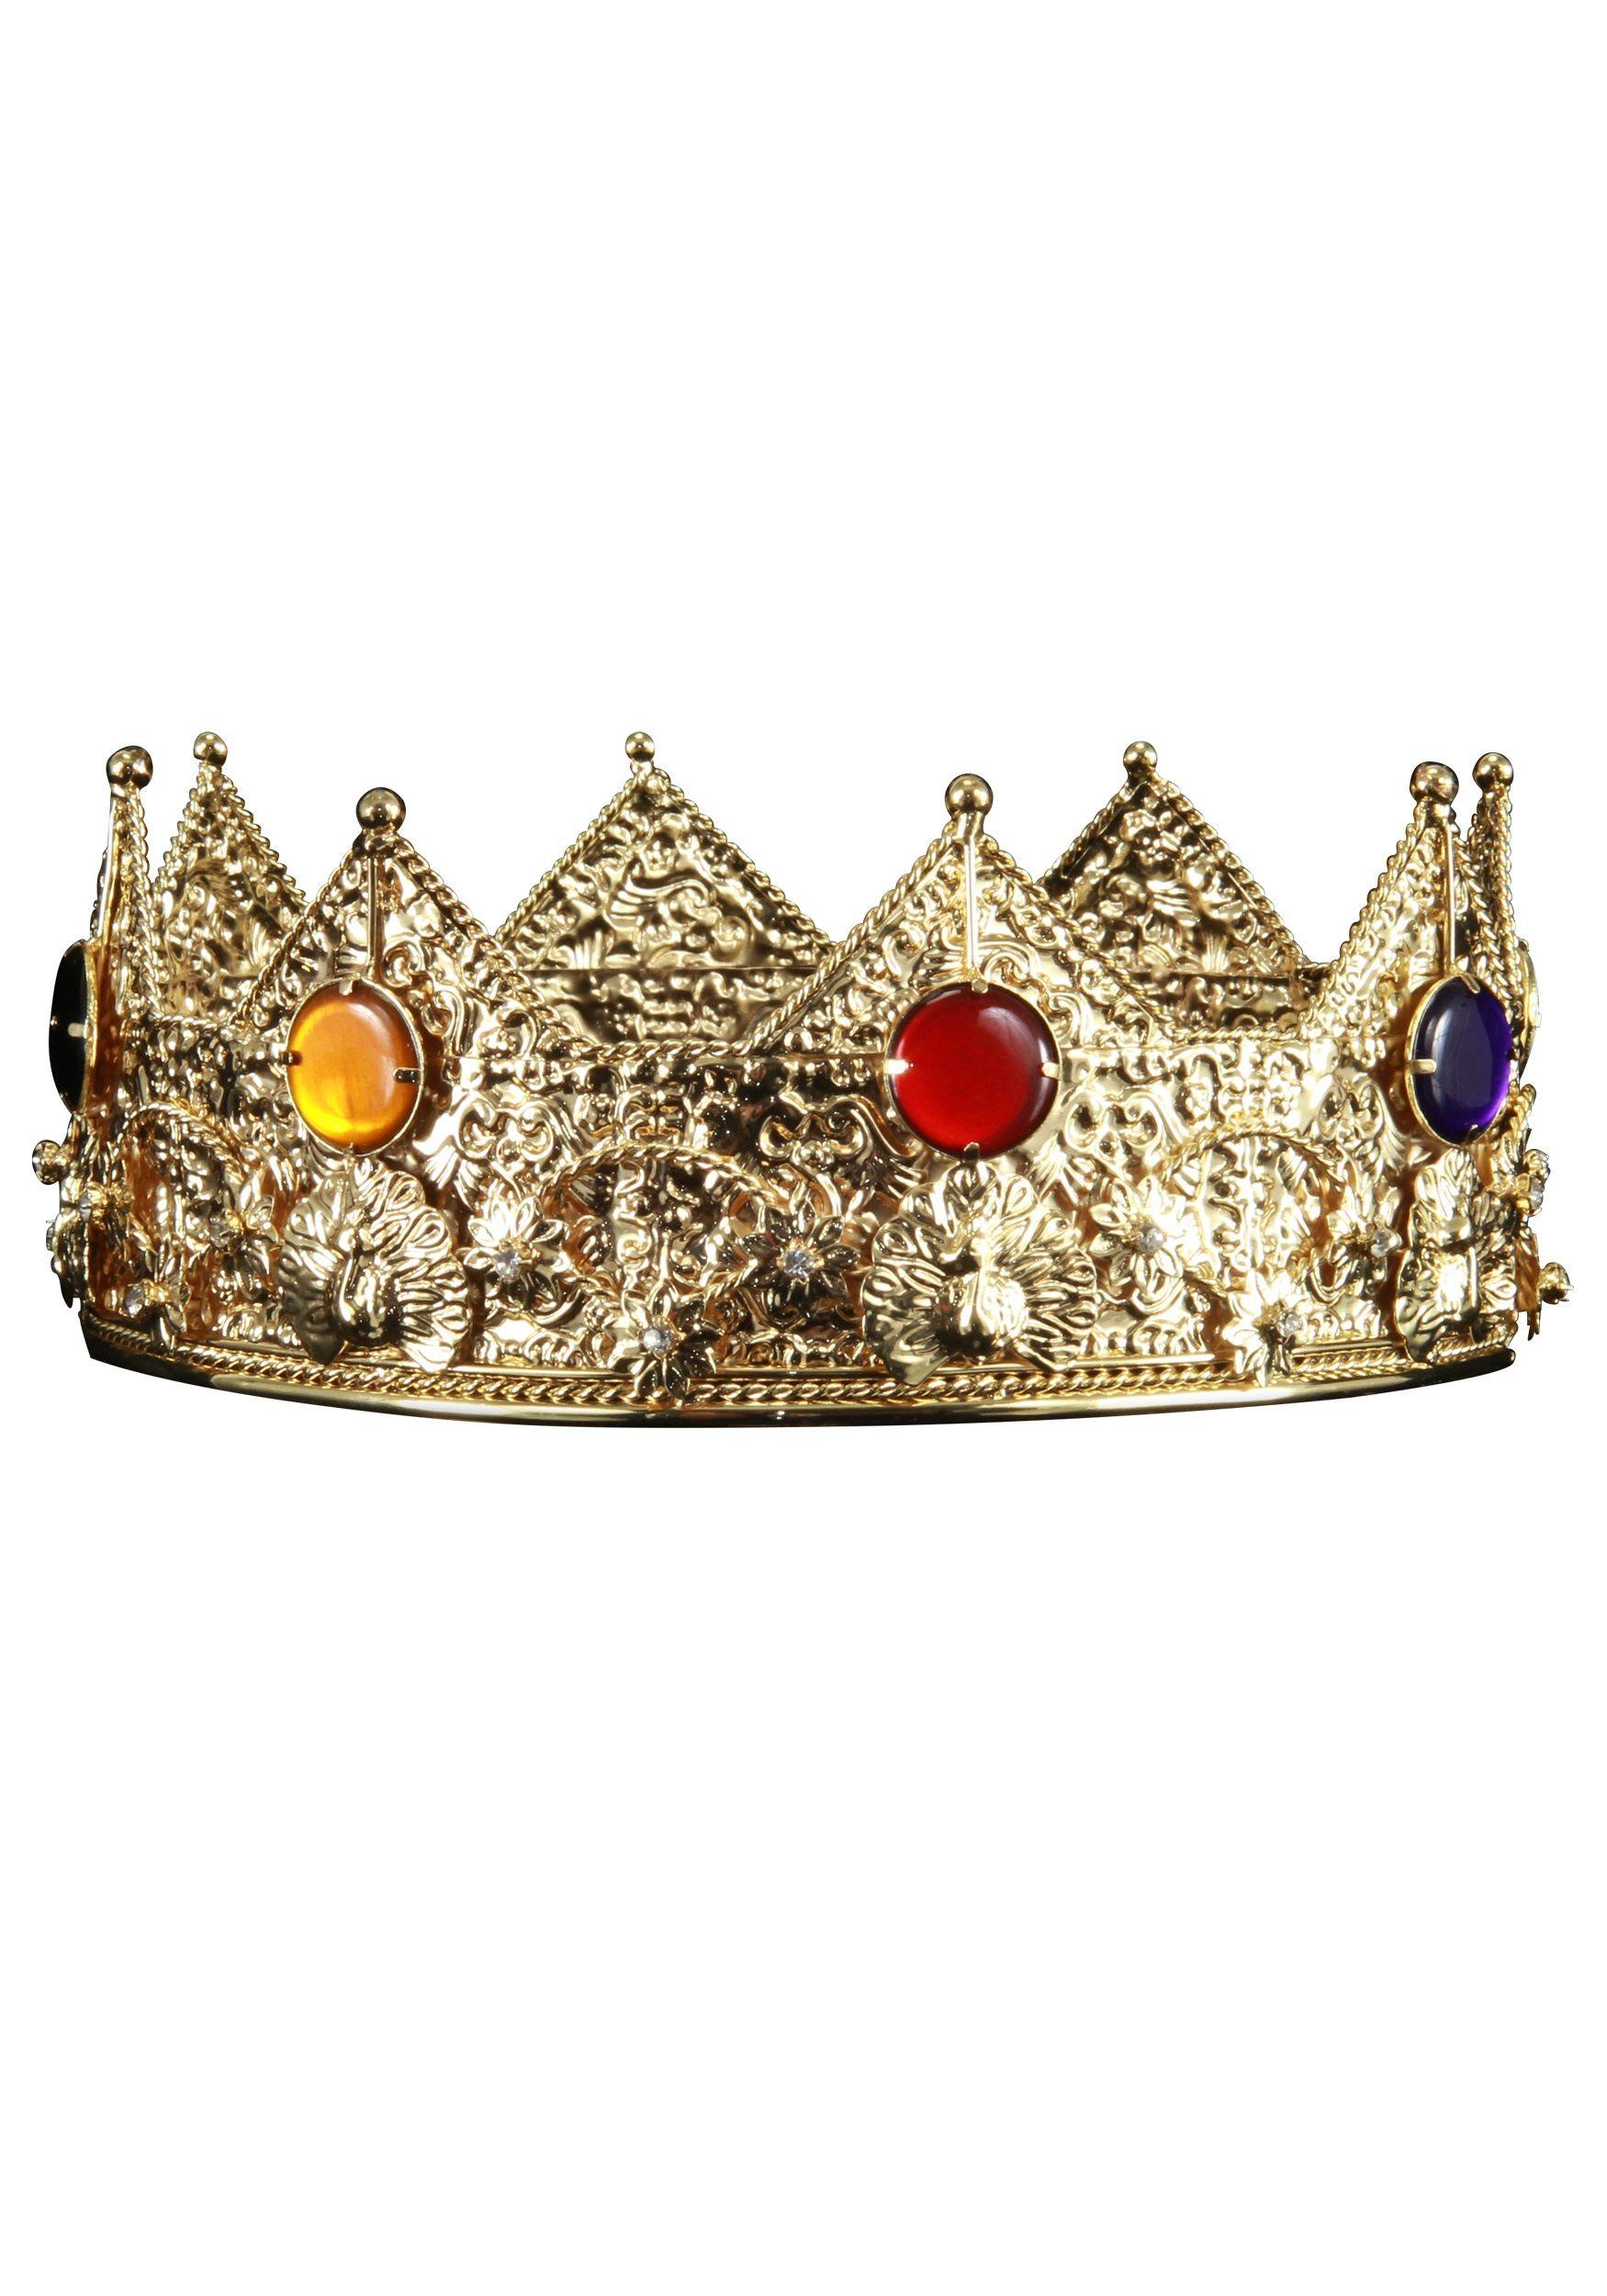 Gold King Crown Ring Gold King Crown Buy New$34.99 ...